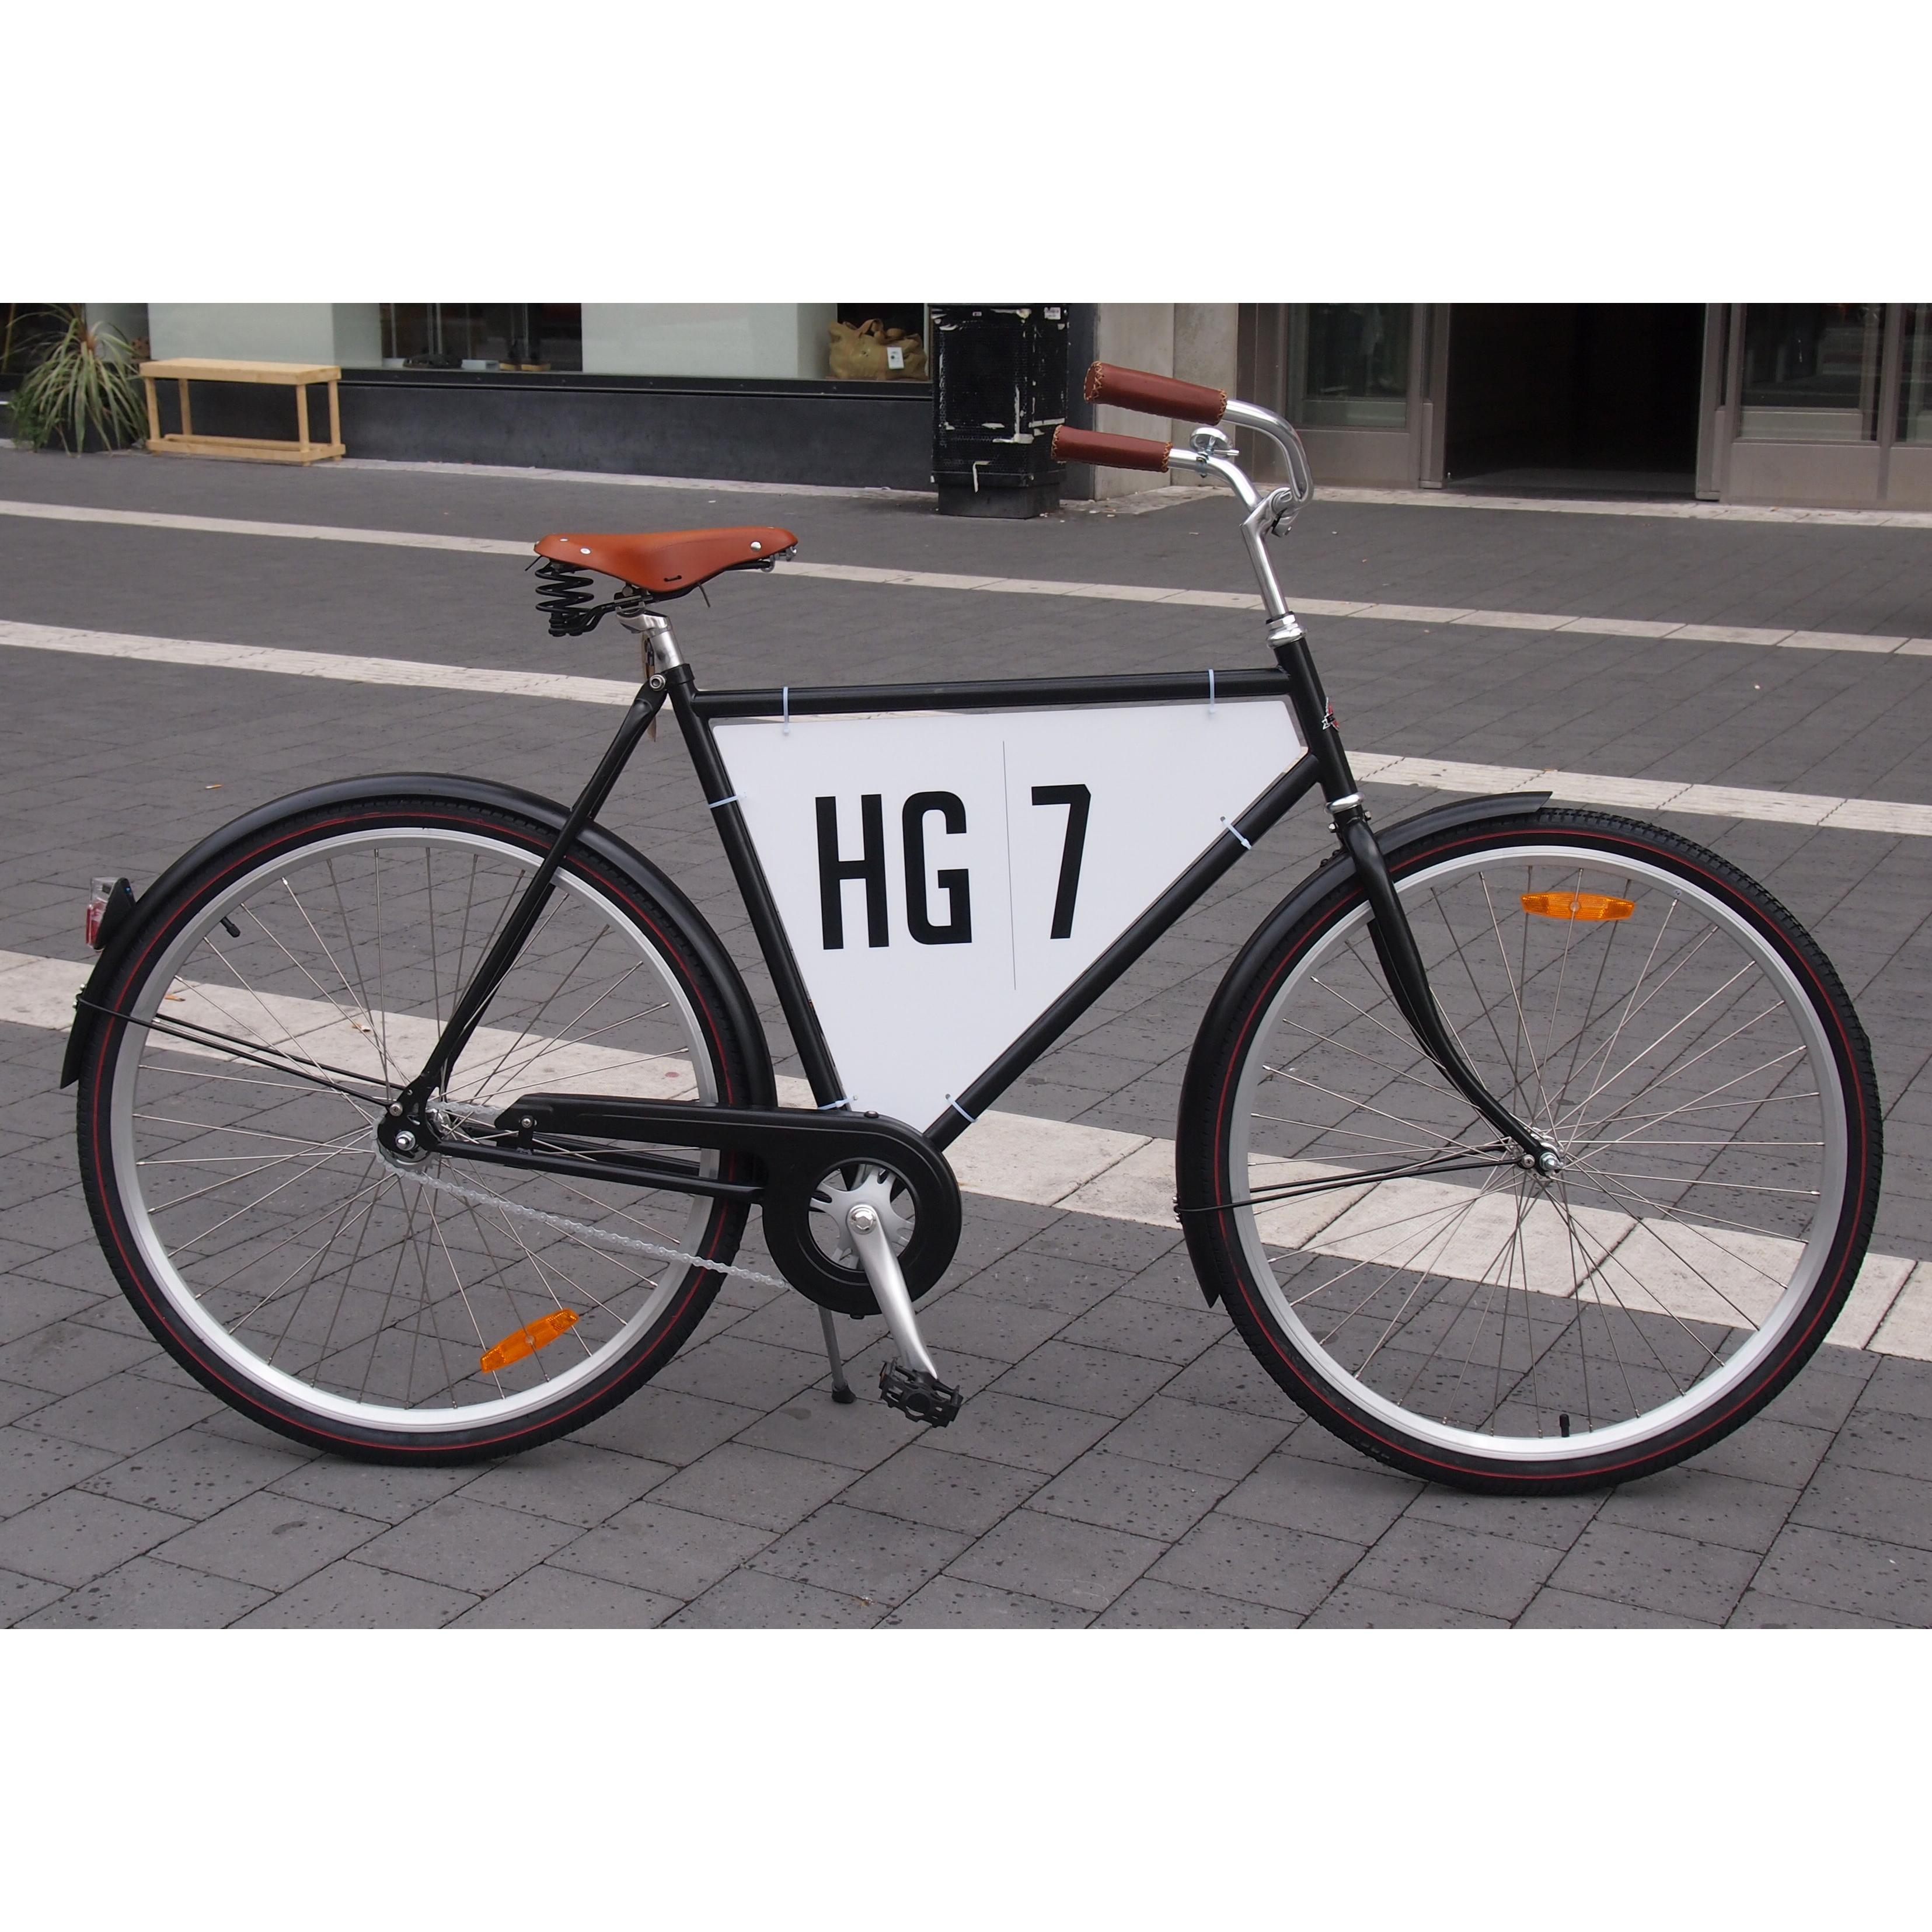 HG7 cykel herr